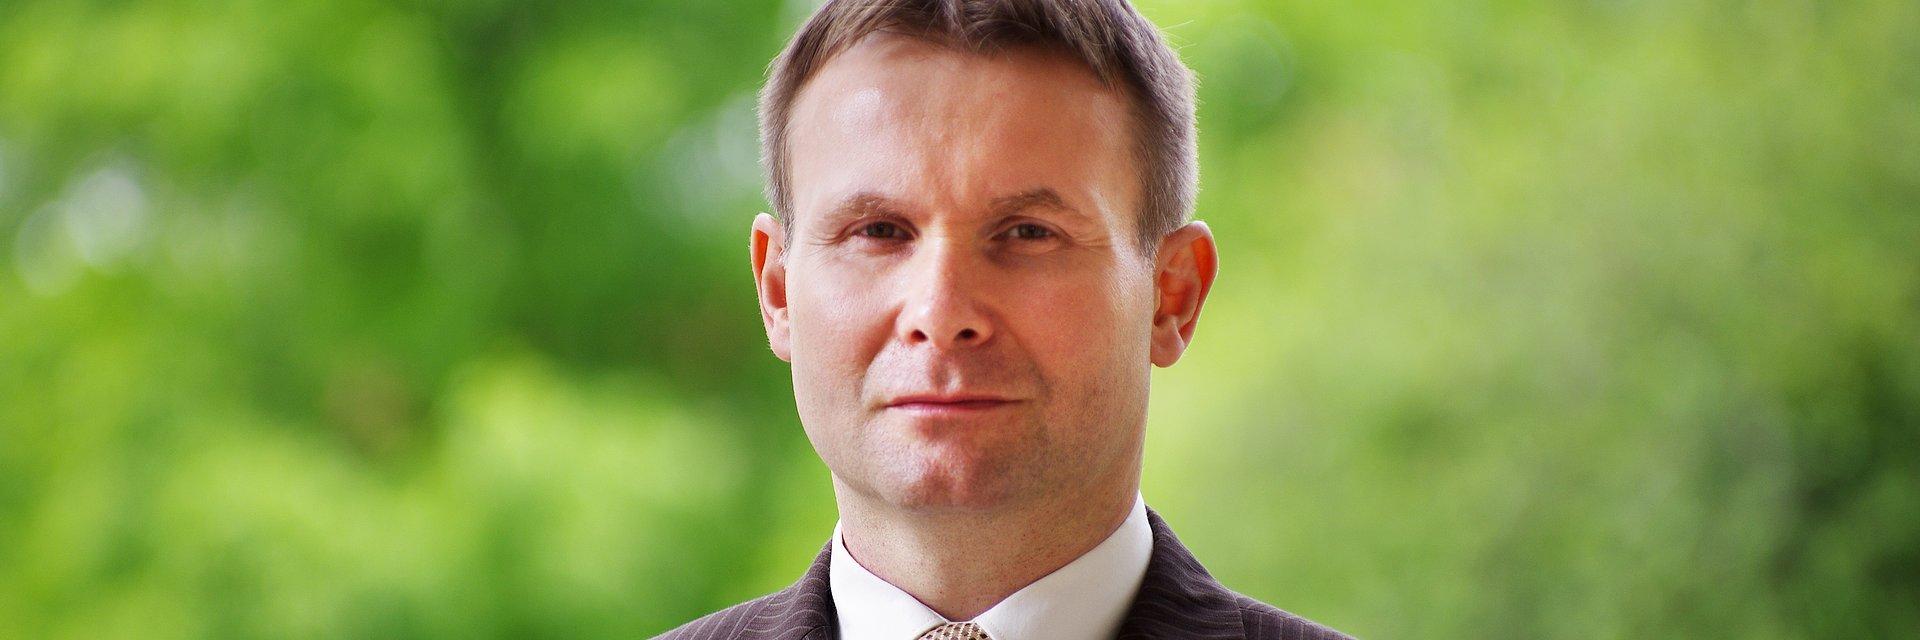 dr hab. Tomasz Duraj, prof. nadzw. UŁ